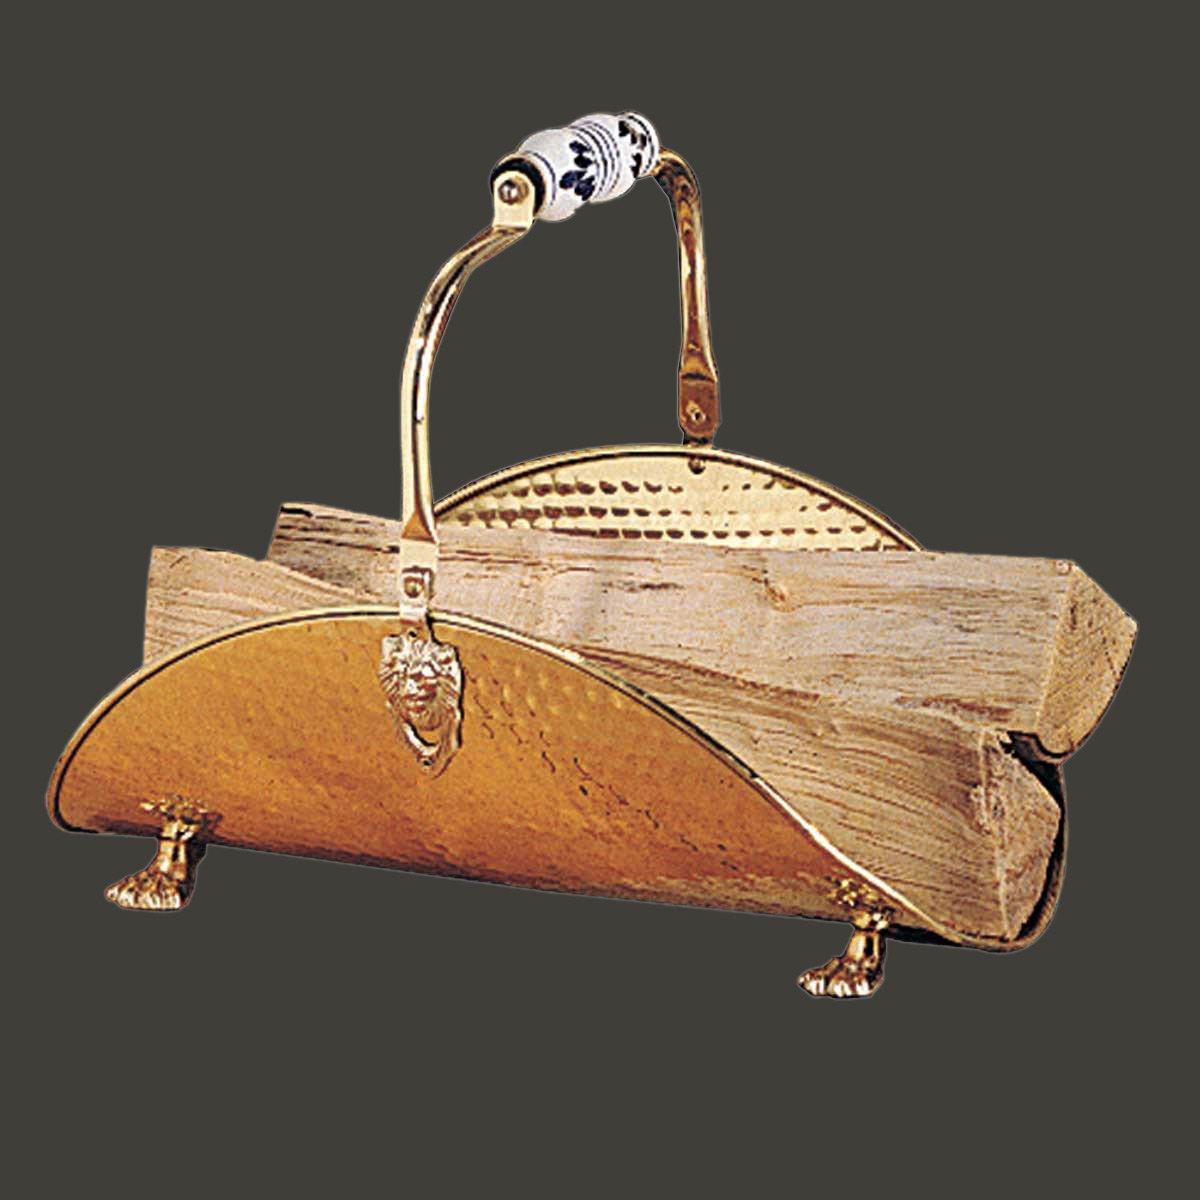 amazoncom decorative brass fireplace log holder vintage design home u0026 kitchen - Fireplace Log Holder